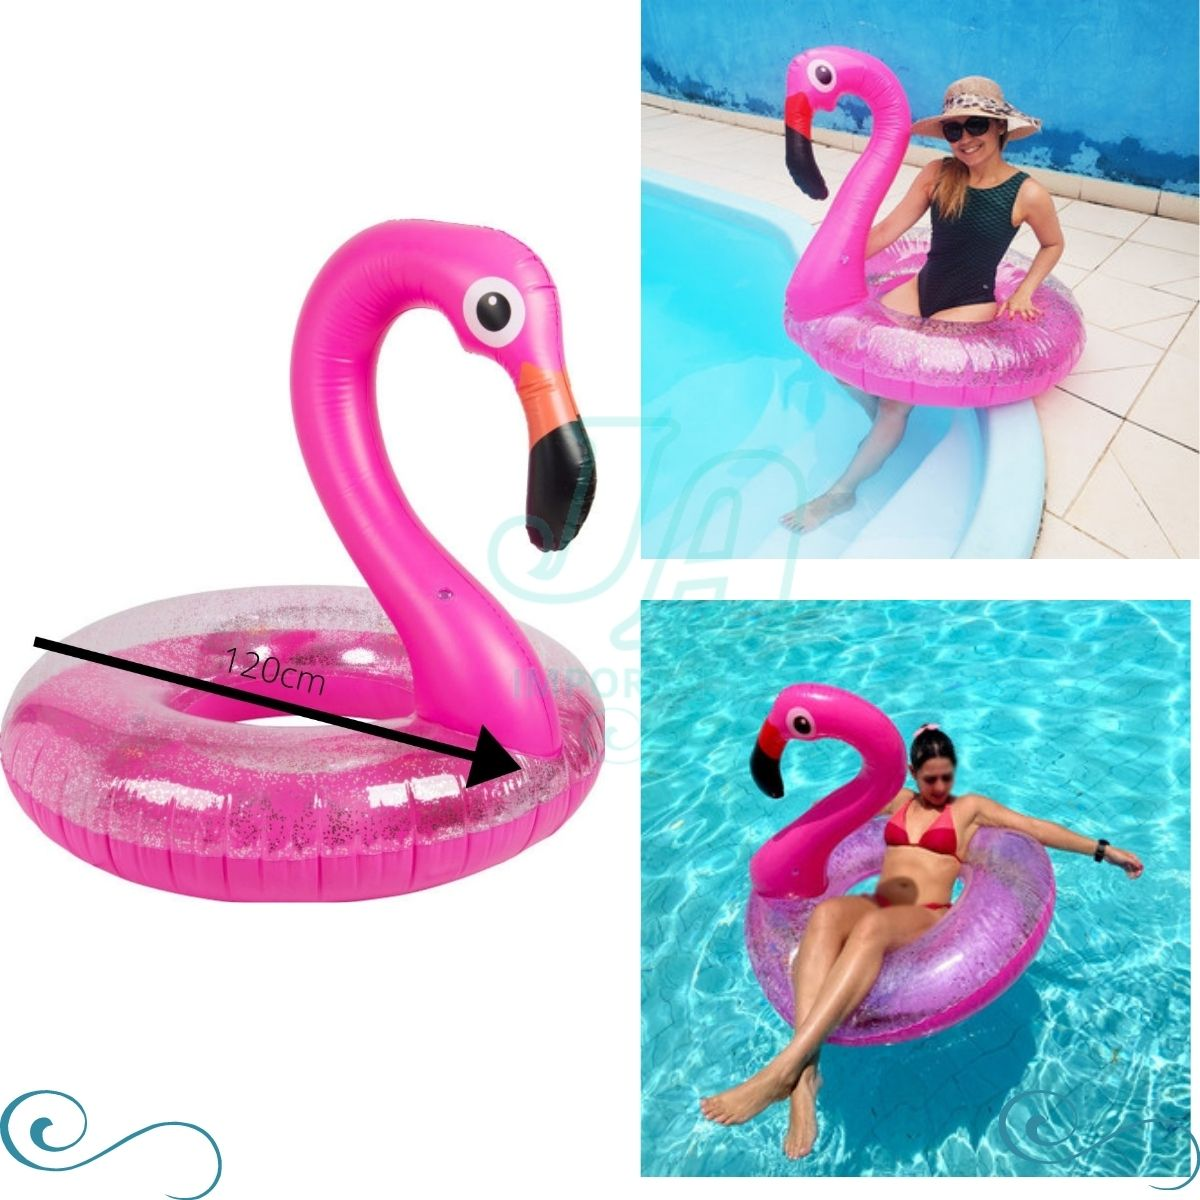 Kit Boia Flamingo grande Adulto gigante piscina inflável com glitter